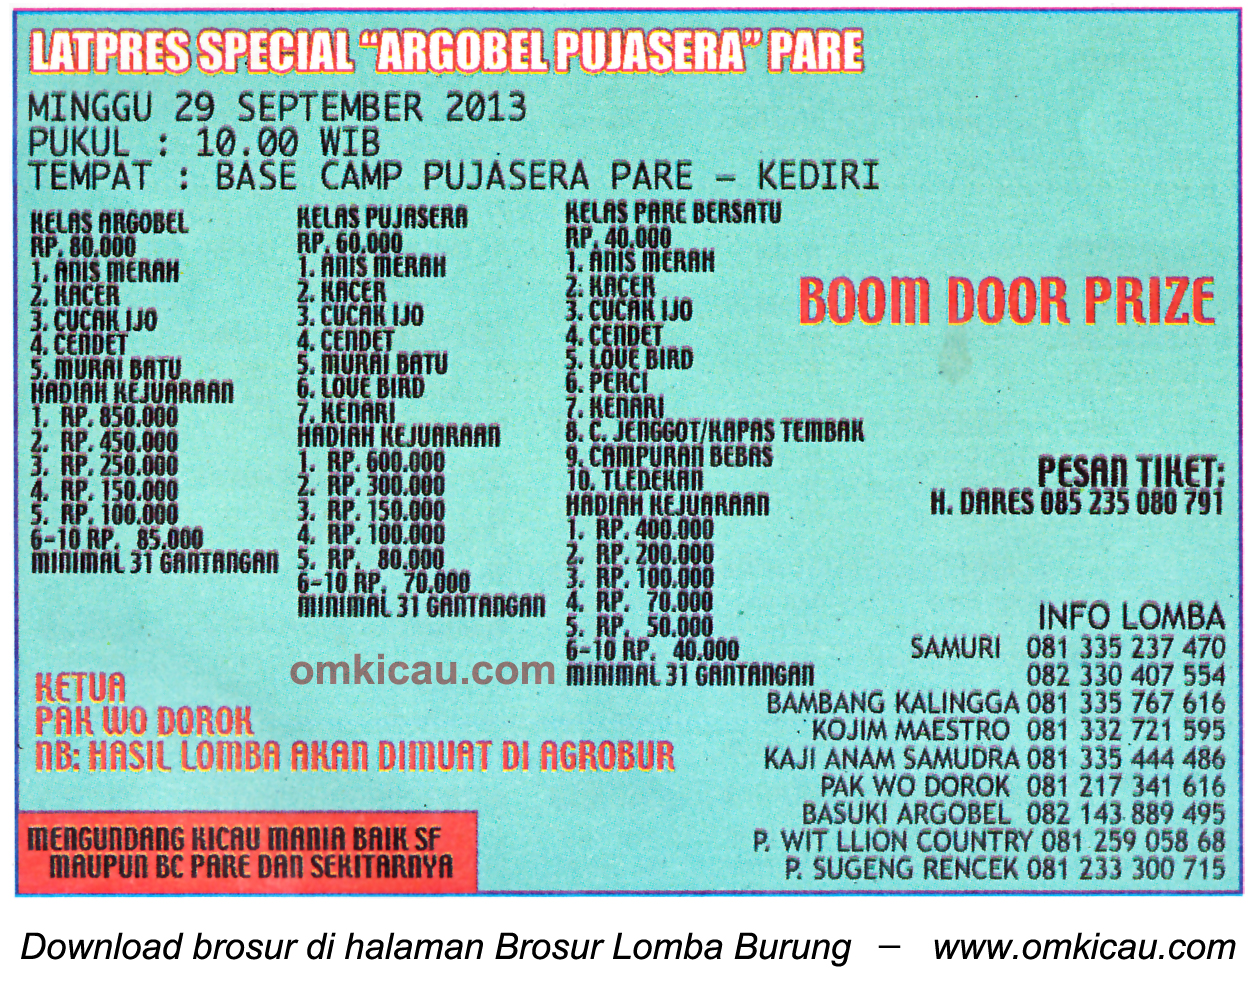 Brosur Latpres Spesial Argobel Pujasera Pare, Kediri, 29 September 2013